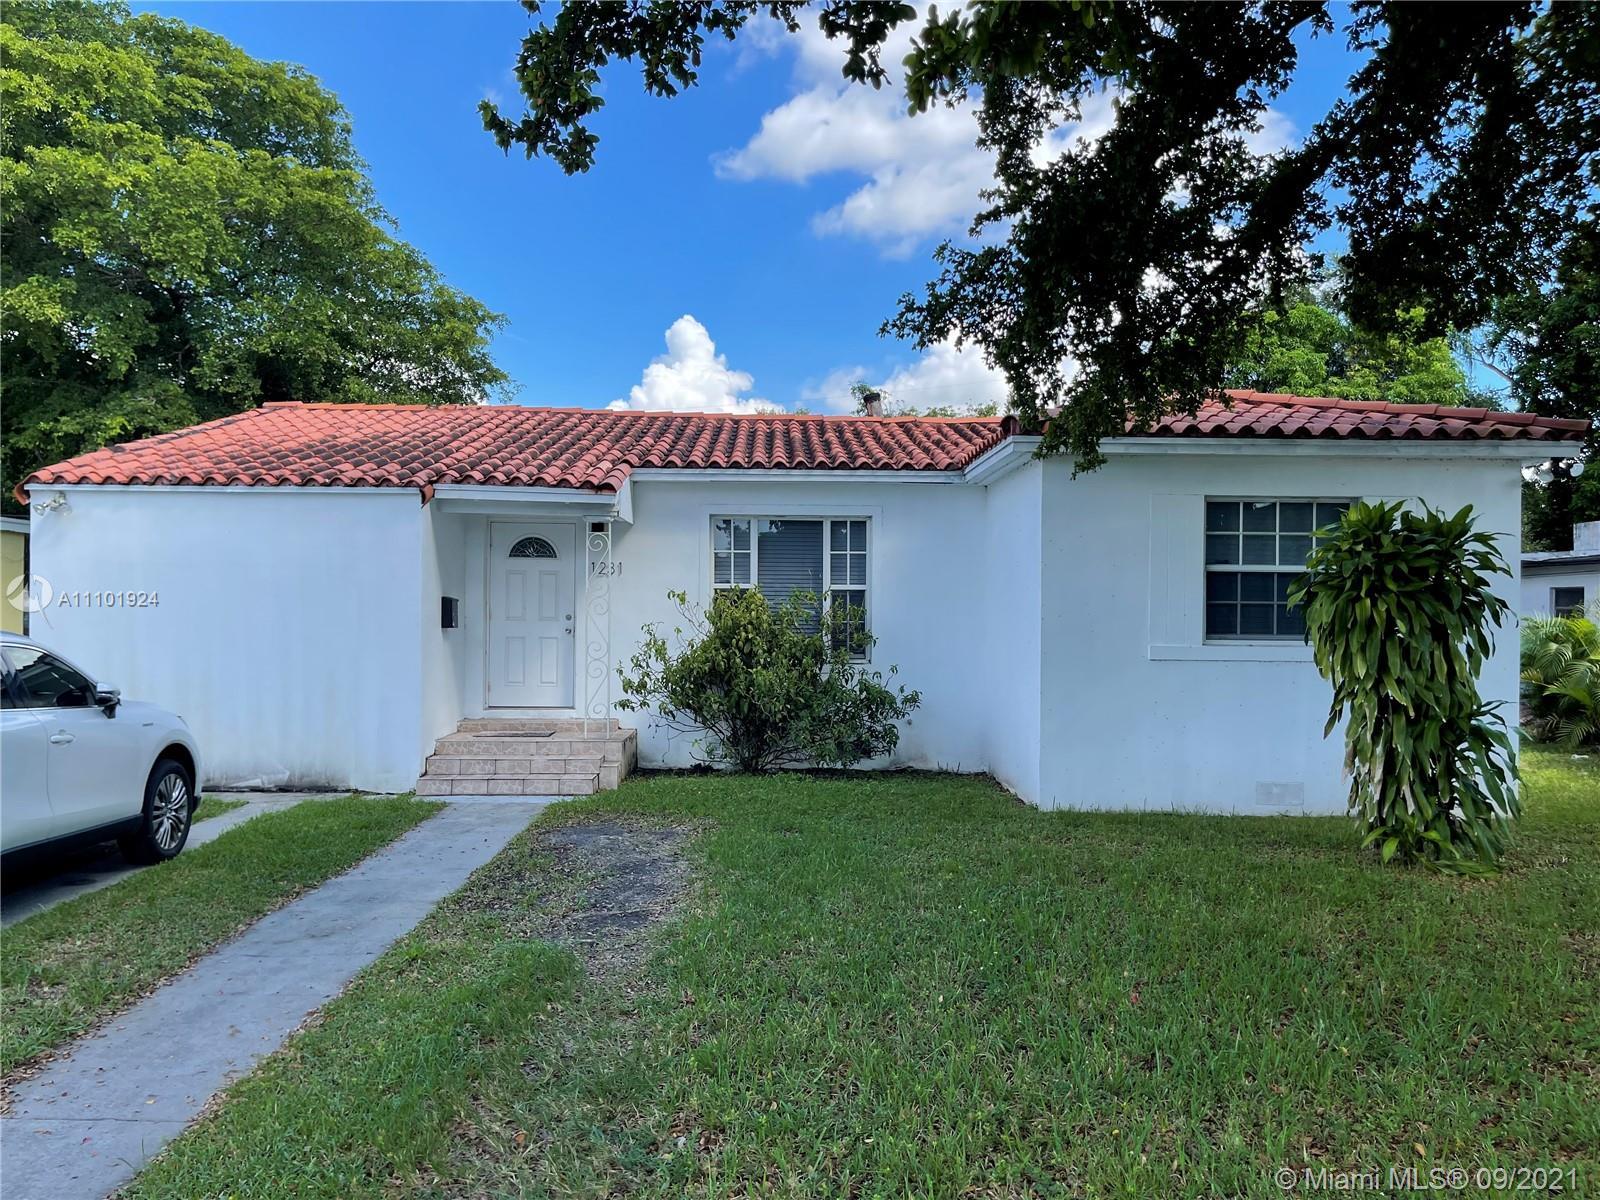 Single Family Home,For Rent,1231 NE 129th St #1231, North Miami, Florida 33161,Brickell,realty,broker,condos near me